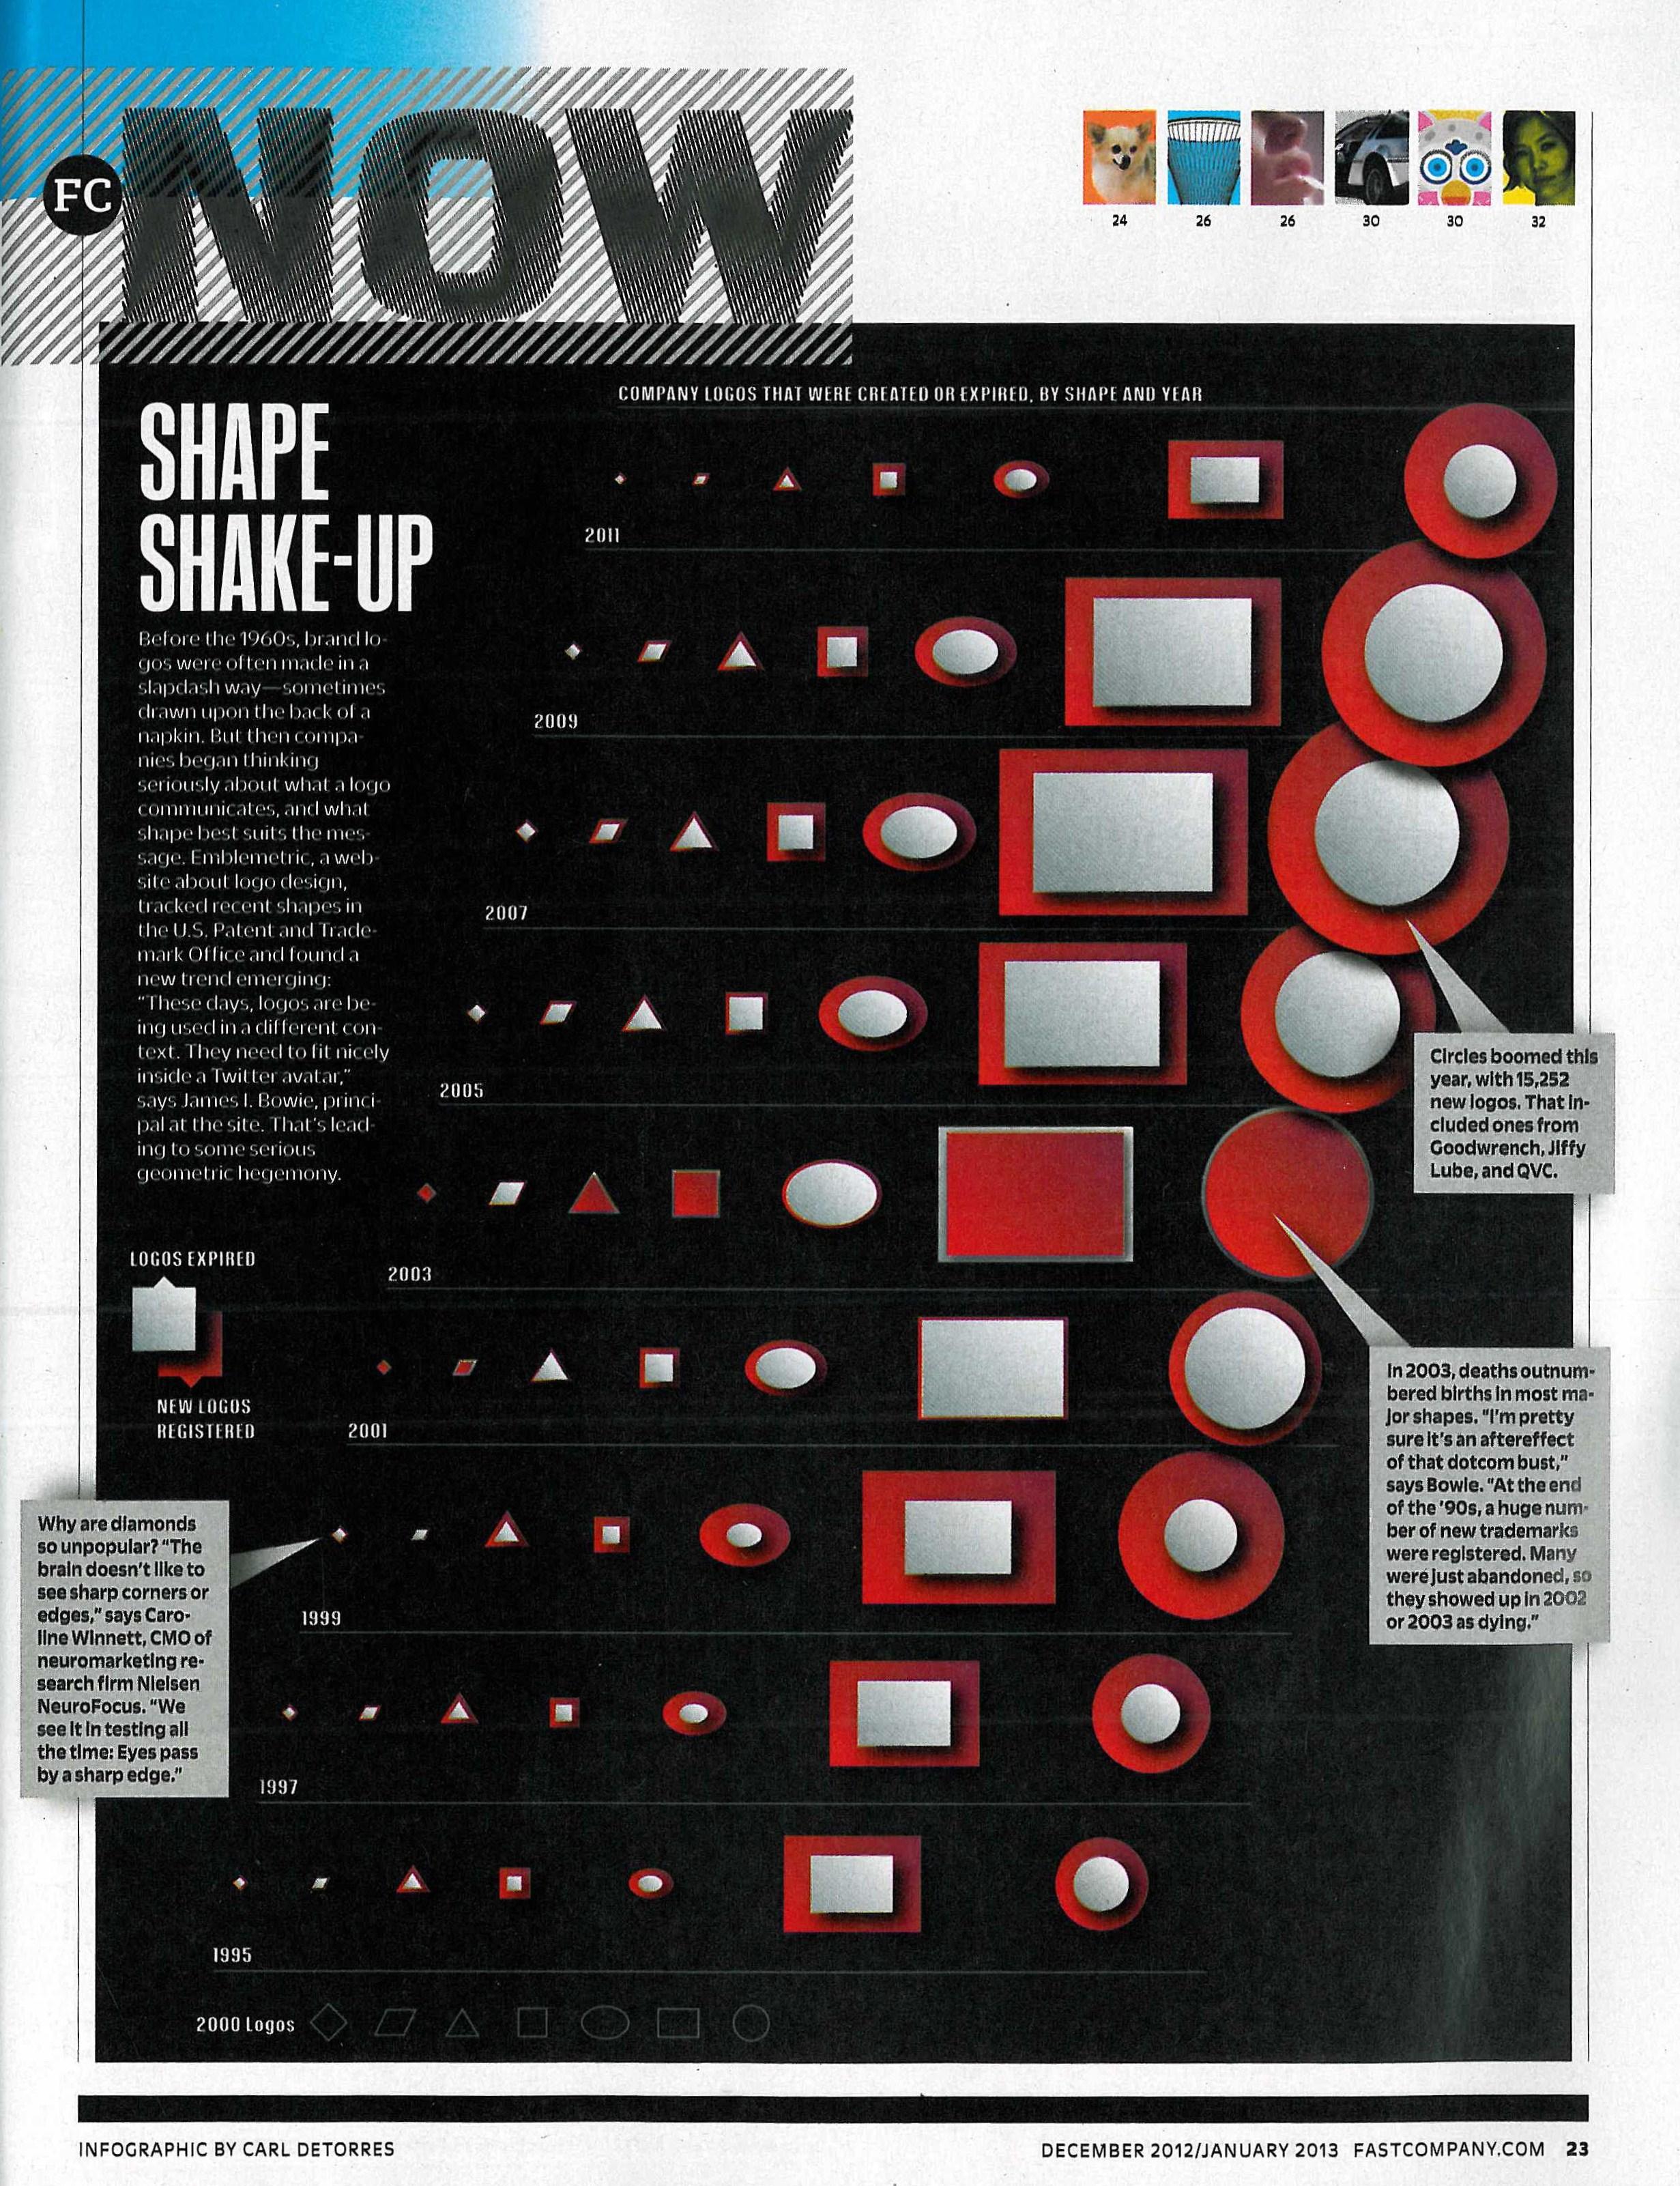 Fast Company Dec 2012 p 23